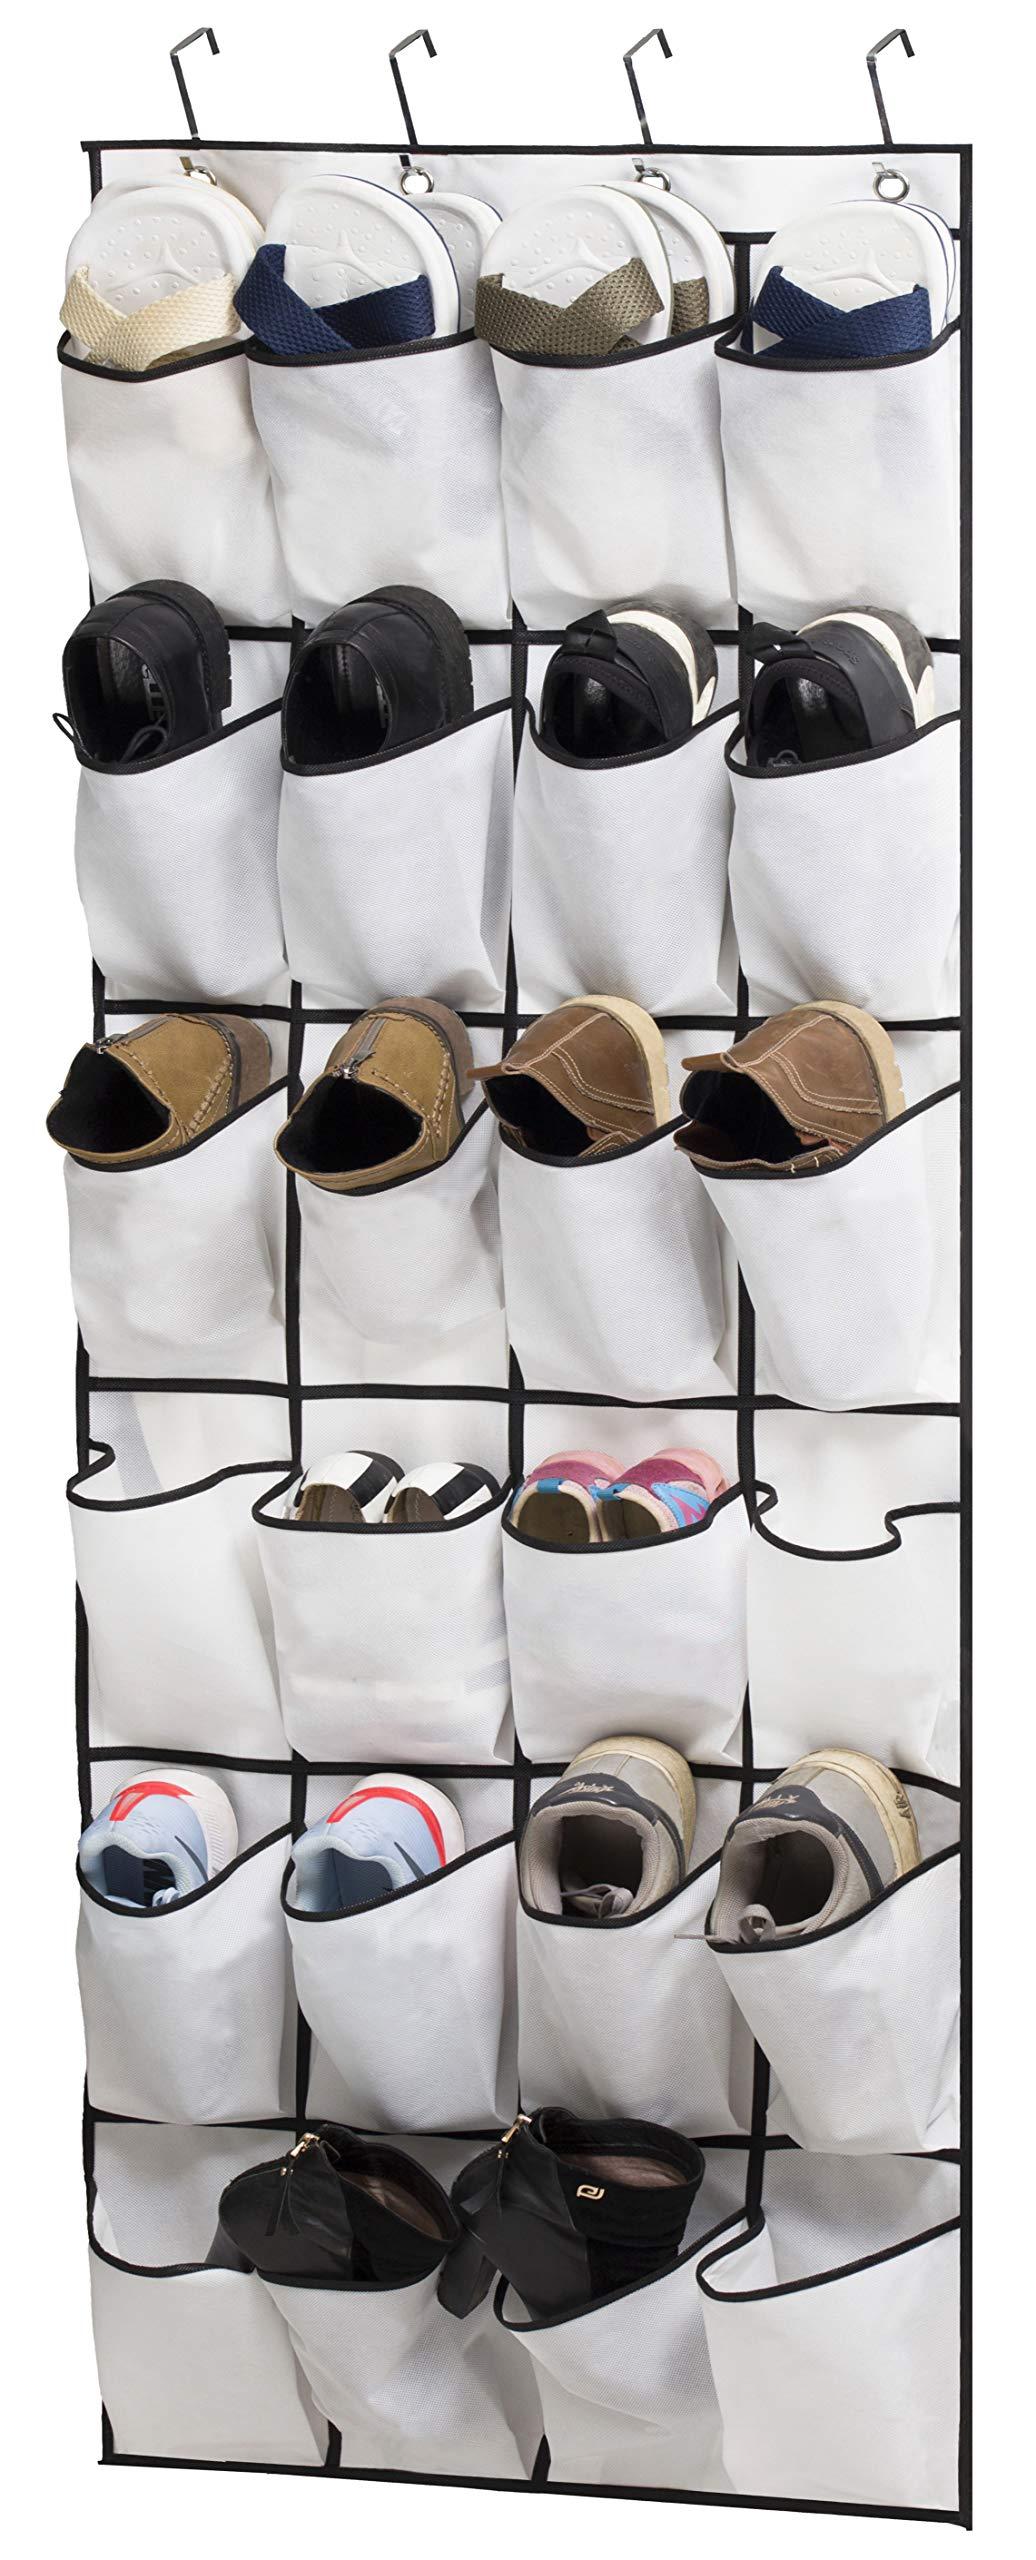 KIMBORA Over Door Shoe Organizer Hanging Shoes Storage 24 Pockets,White